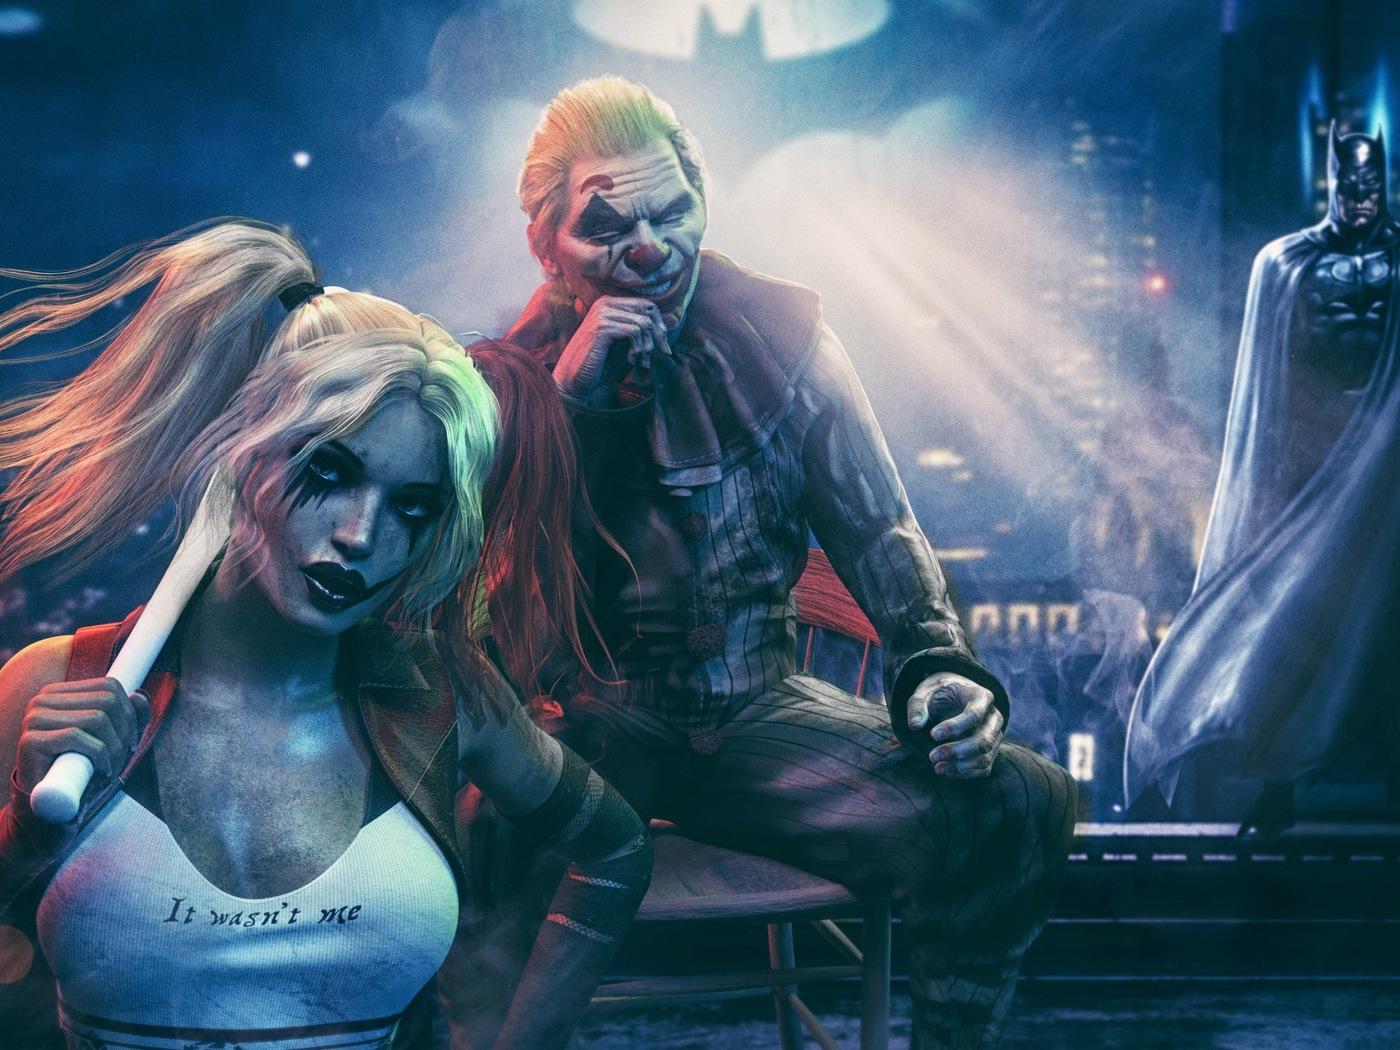 joker-with-harley-quinn-and-batman-fh.jpg